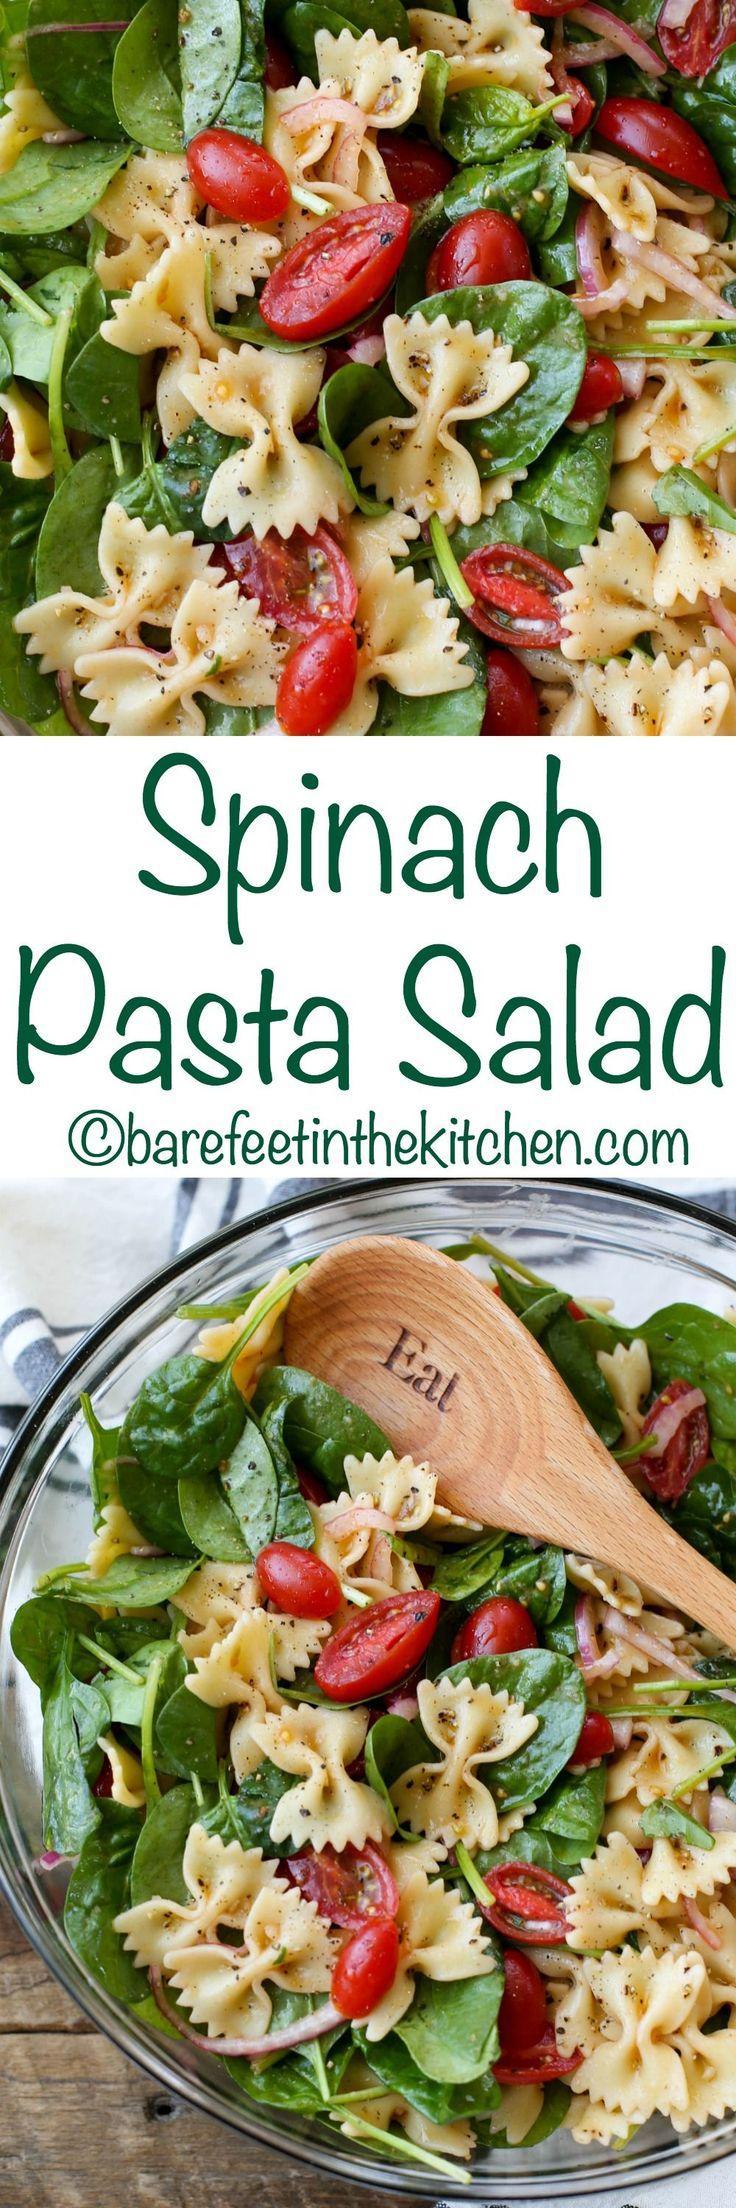 Spinach Pasta Salad - get the recipe at barefeetinthekitchen.com